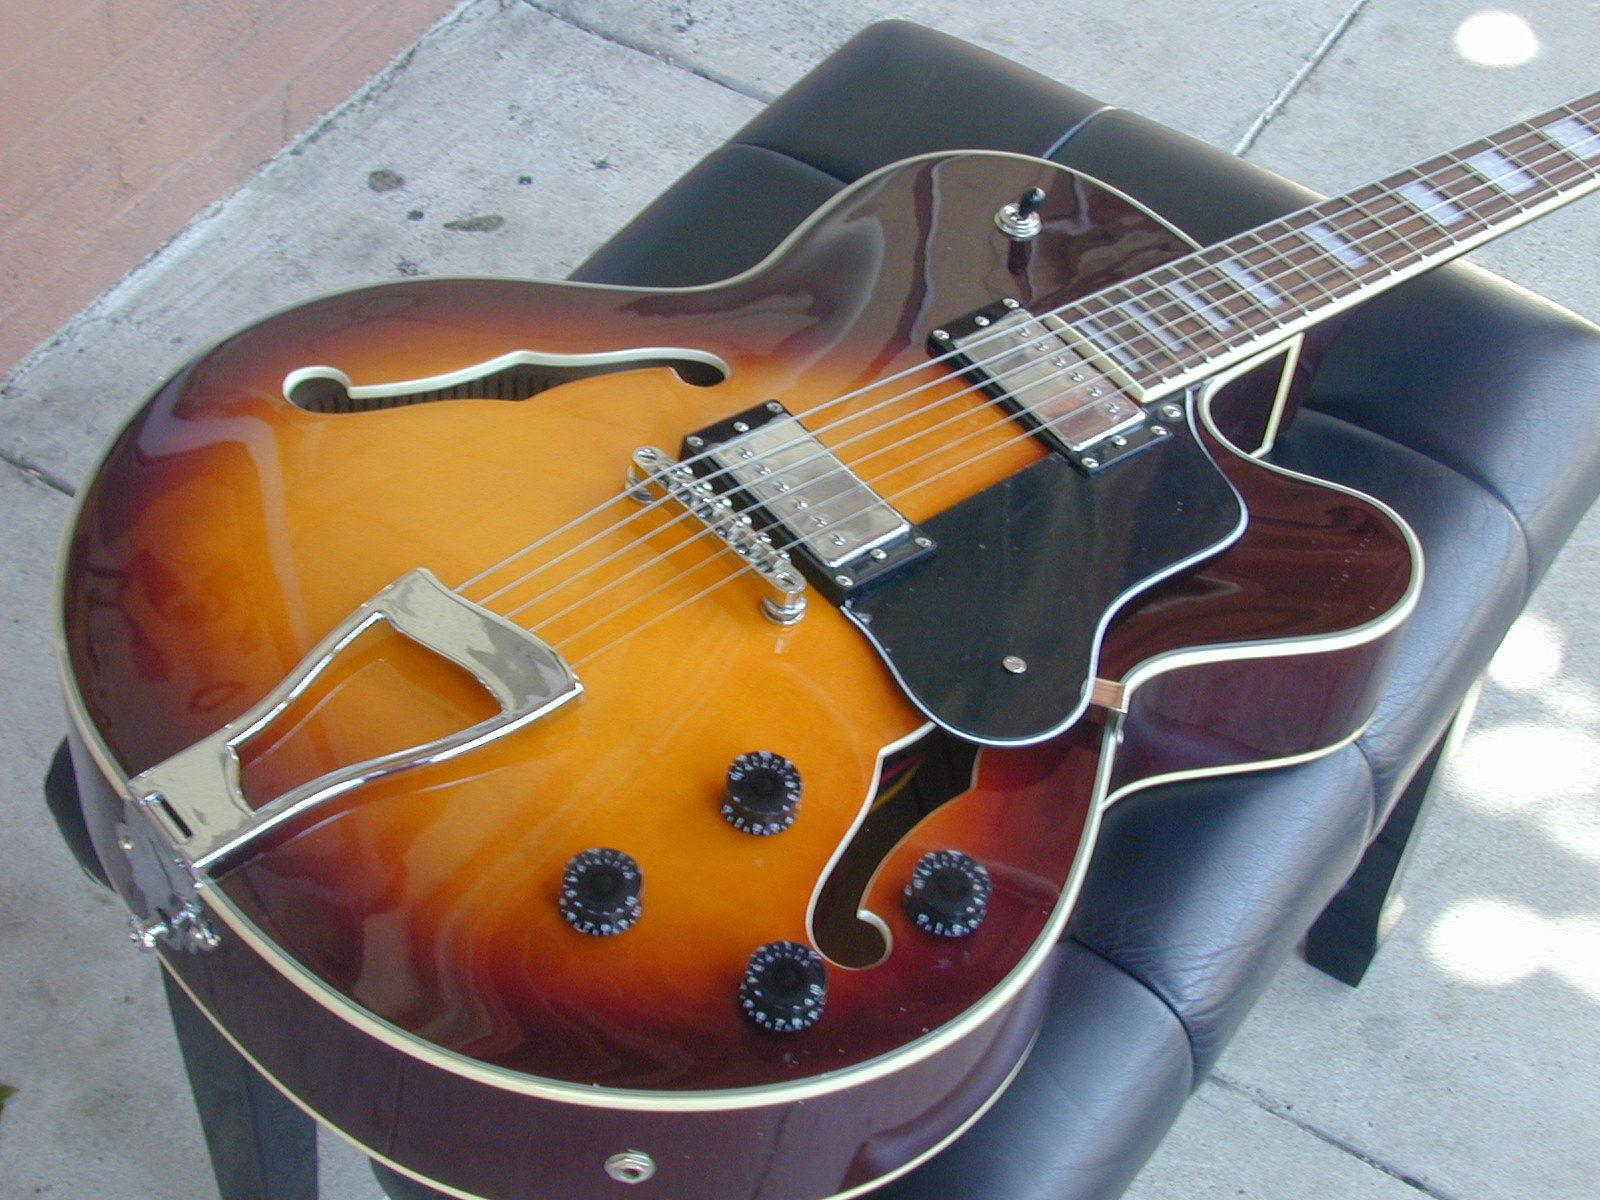 custom shop l 5 jazz guitar sunburst l5 electric guitar wholesale guitars from china guitar. Black Bedroom Furniture Sets. Home Design Ideas